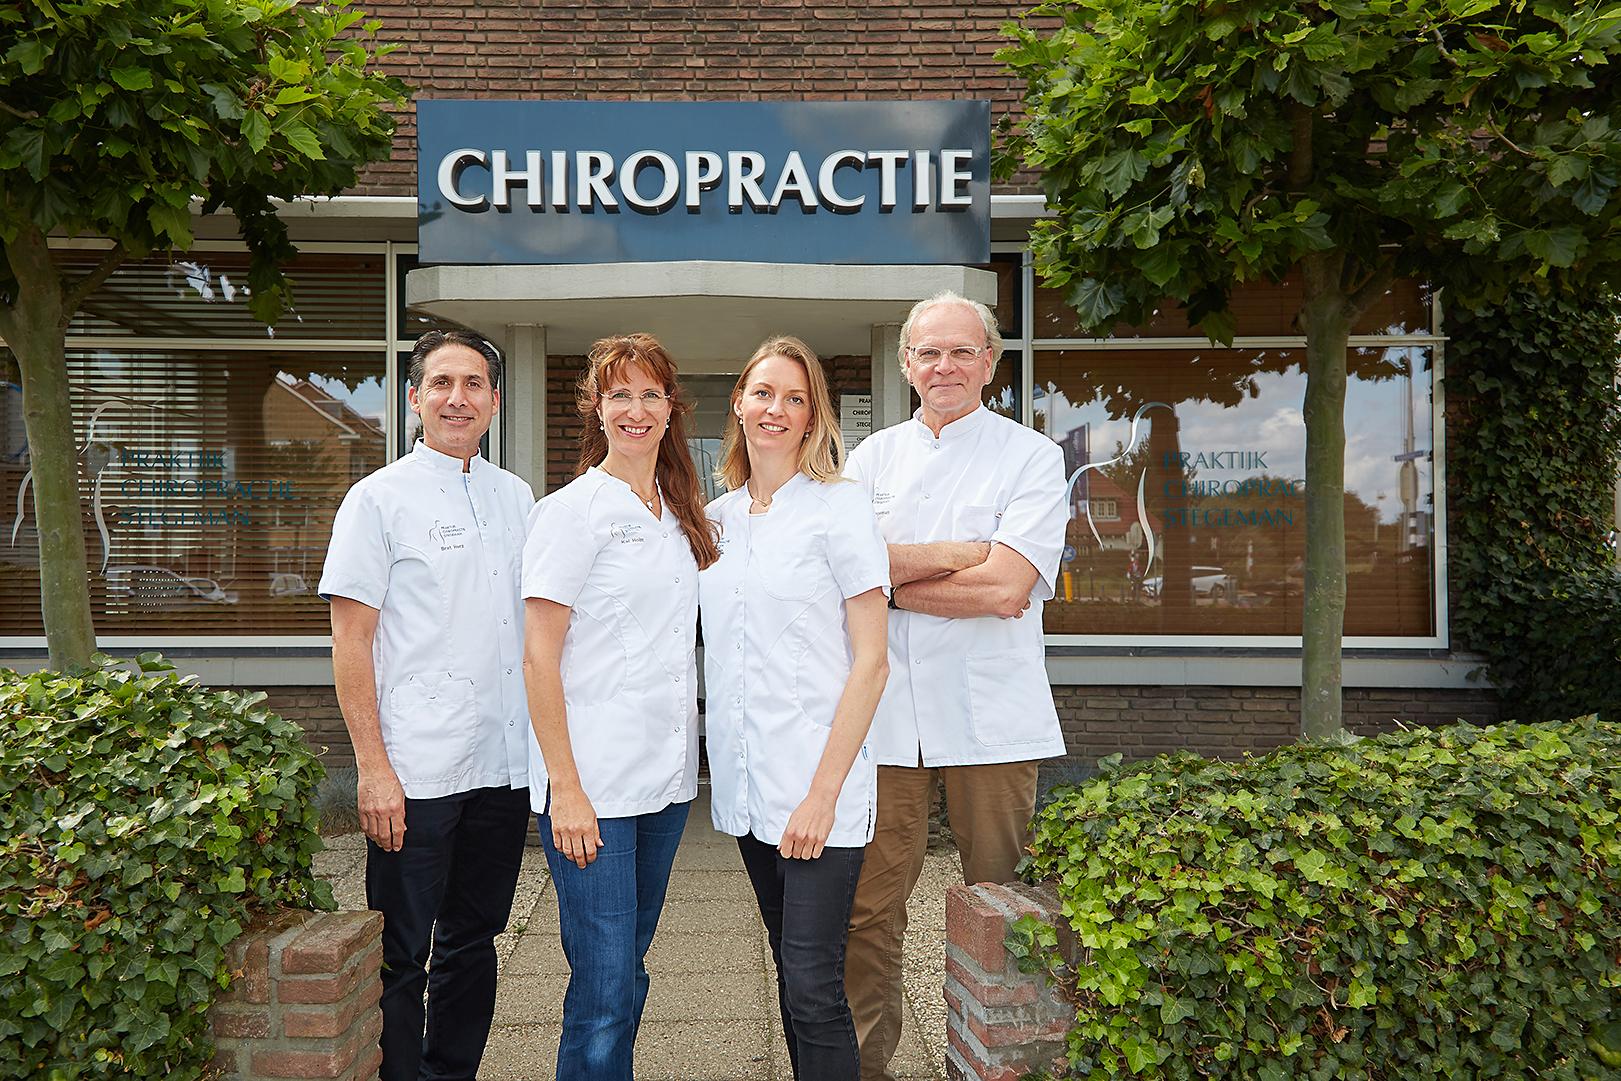 Chiropractie team 2019-1611_website banner.jpg